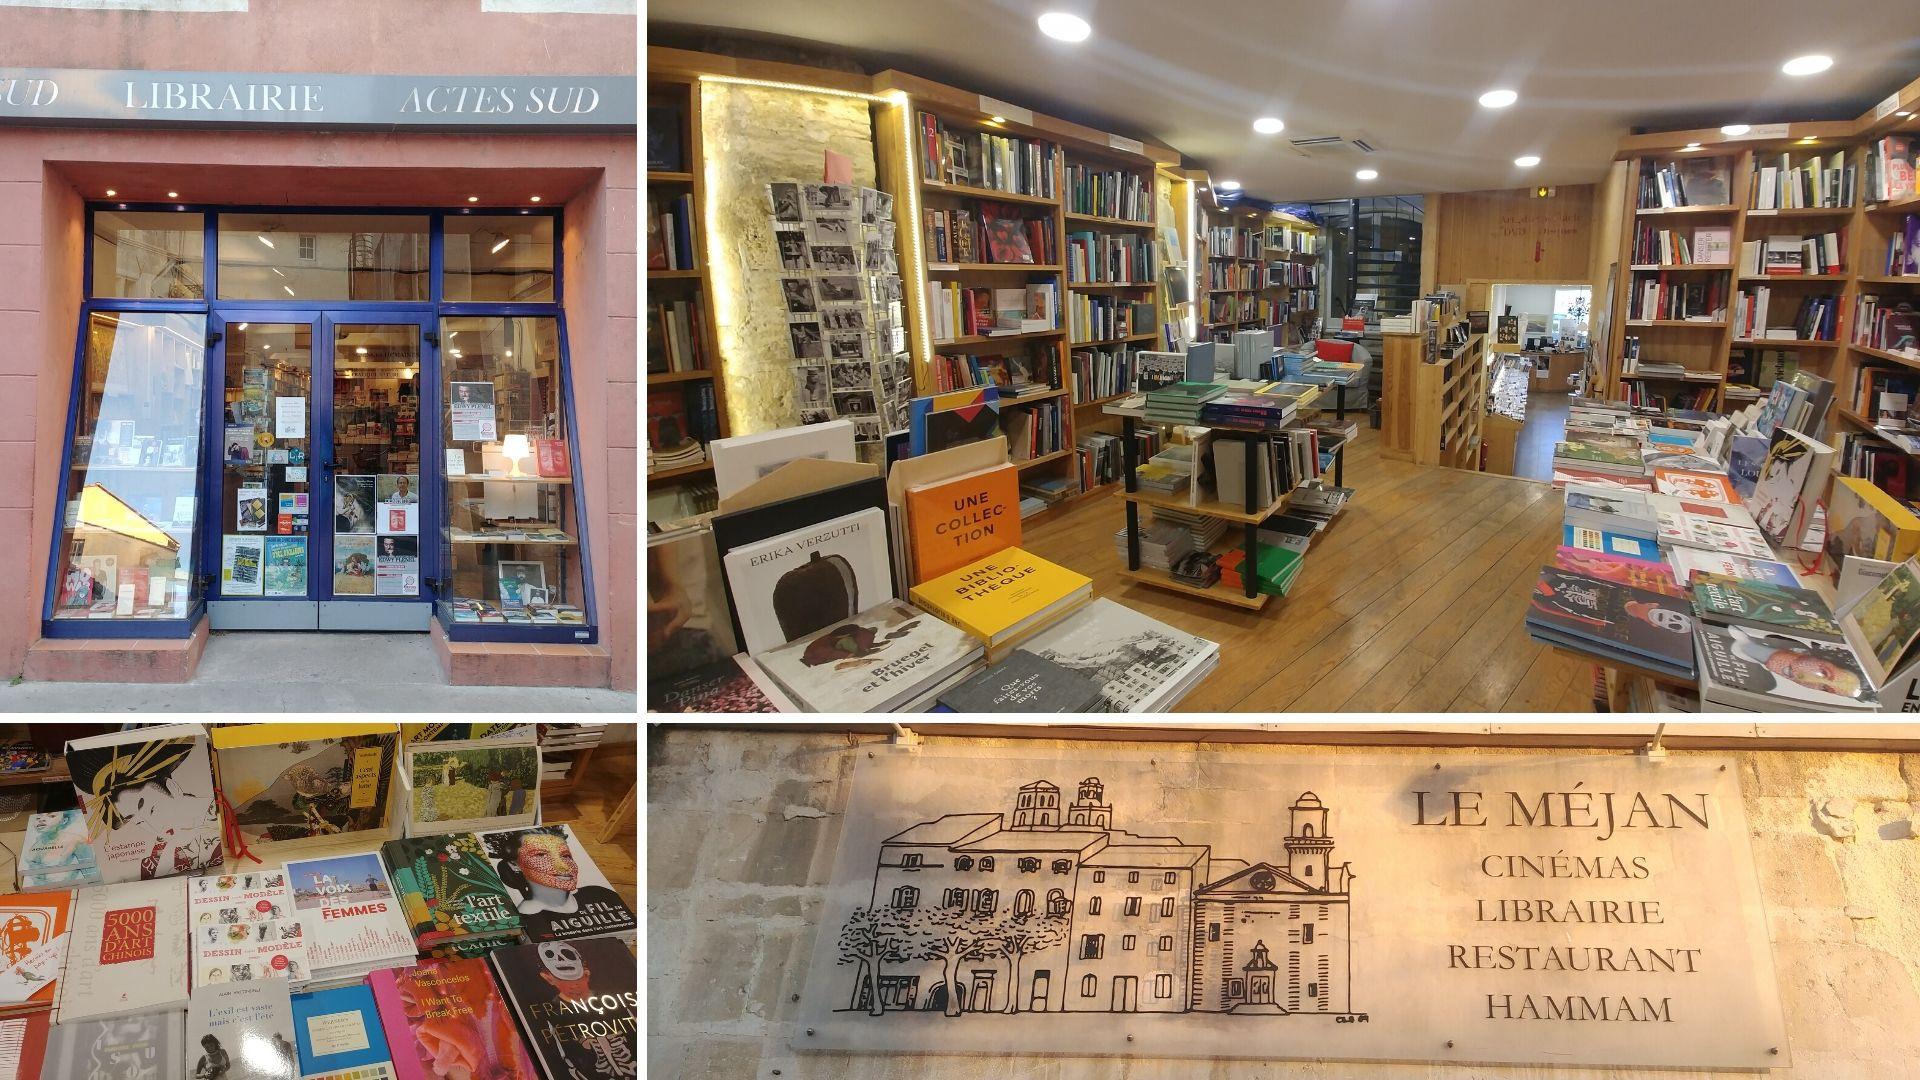 Arles librairie actes sud hammam escapade printemps que faire que voir